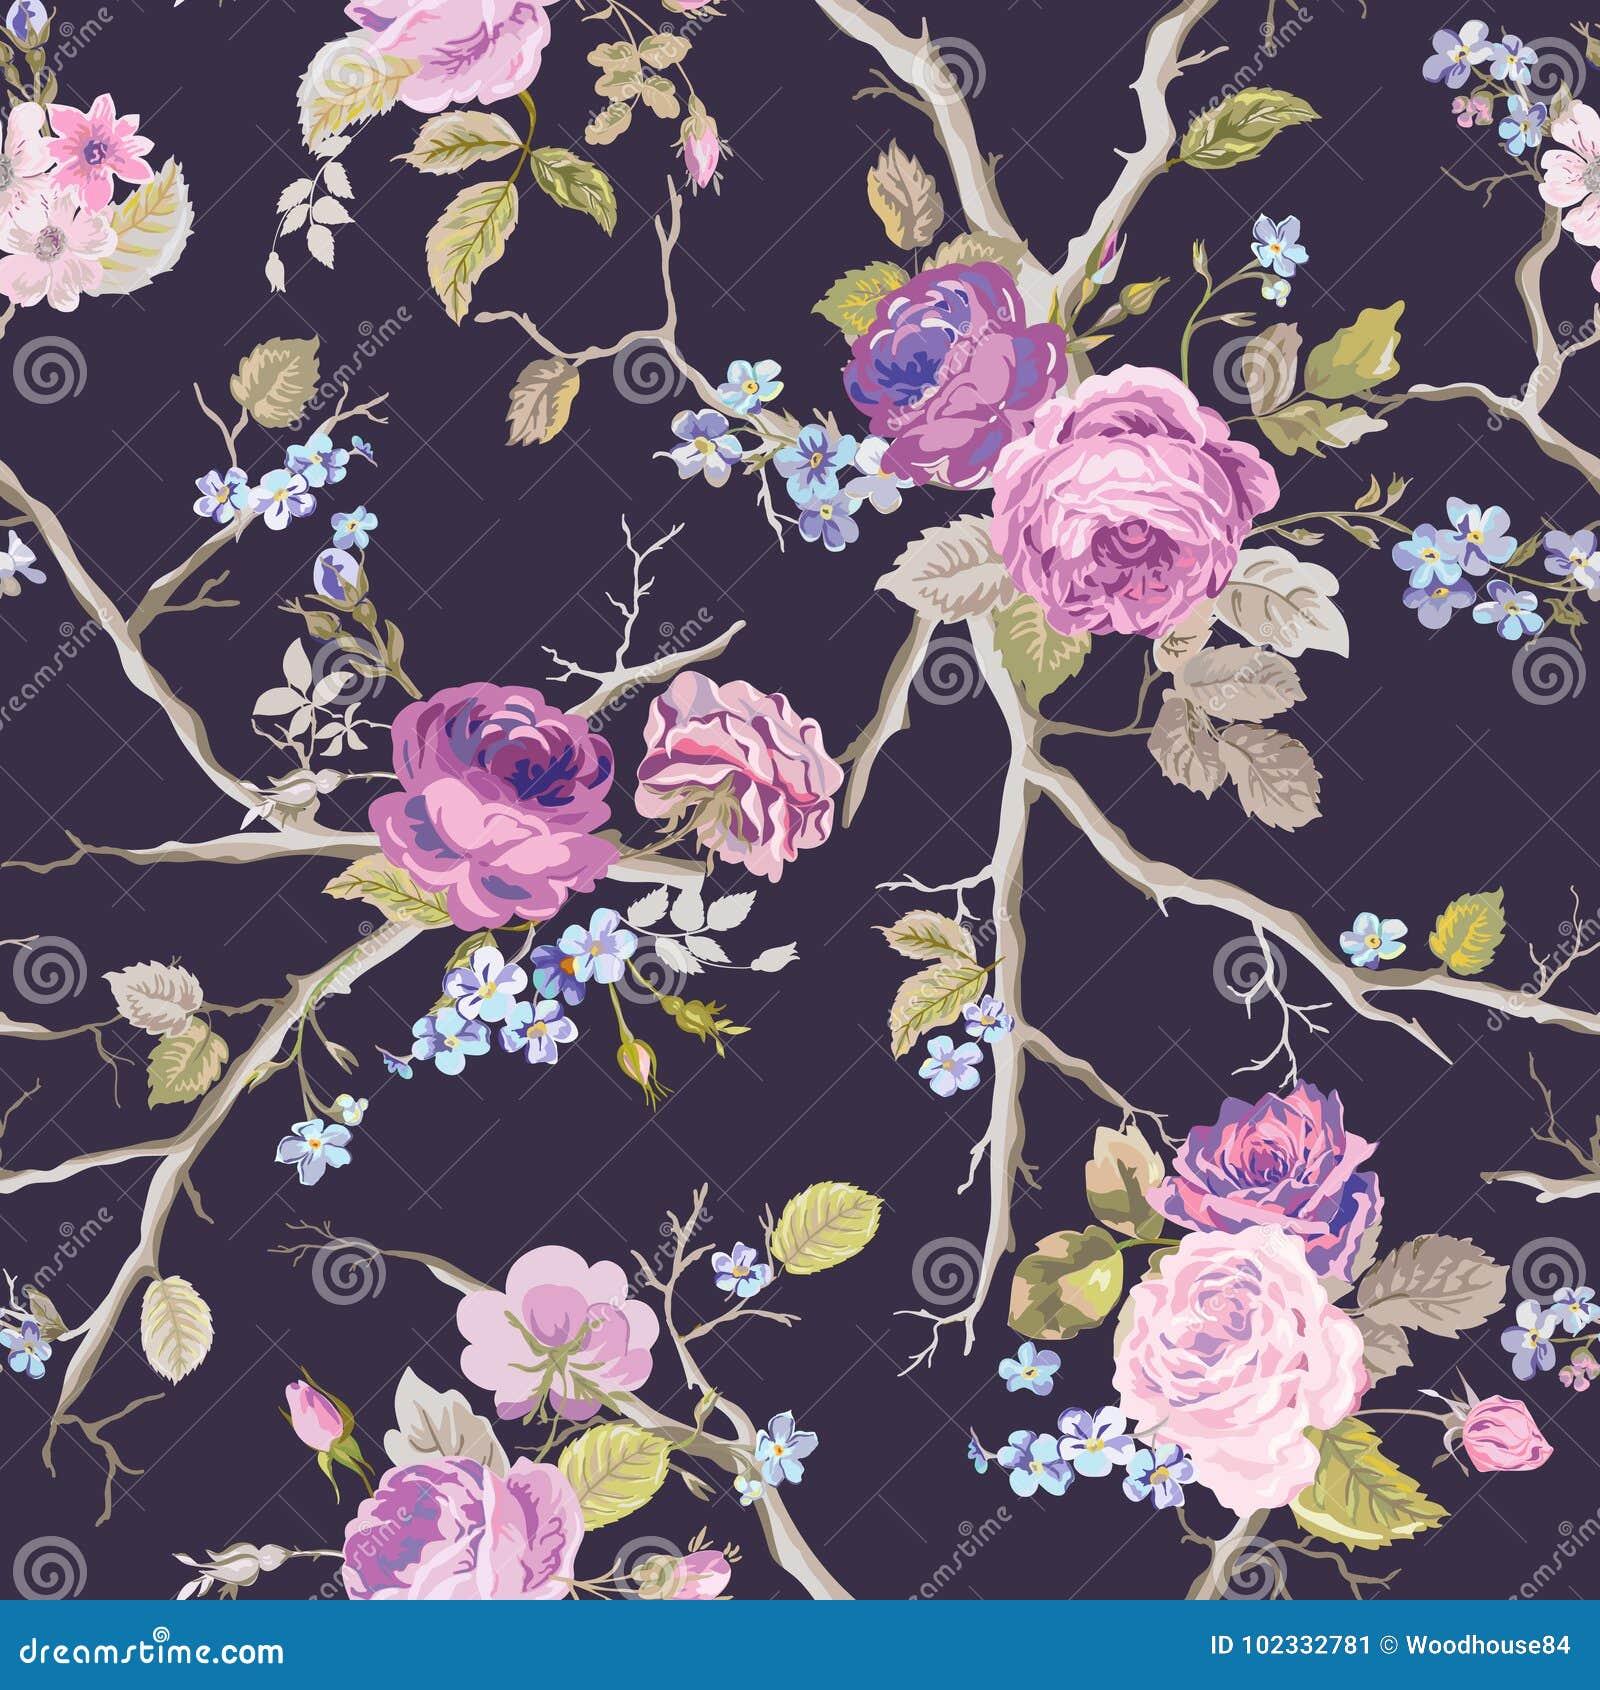 Violet Roses Flowers Texture Background Reticolo floreale senza giunte